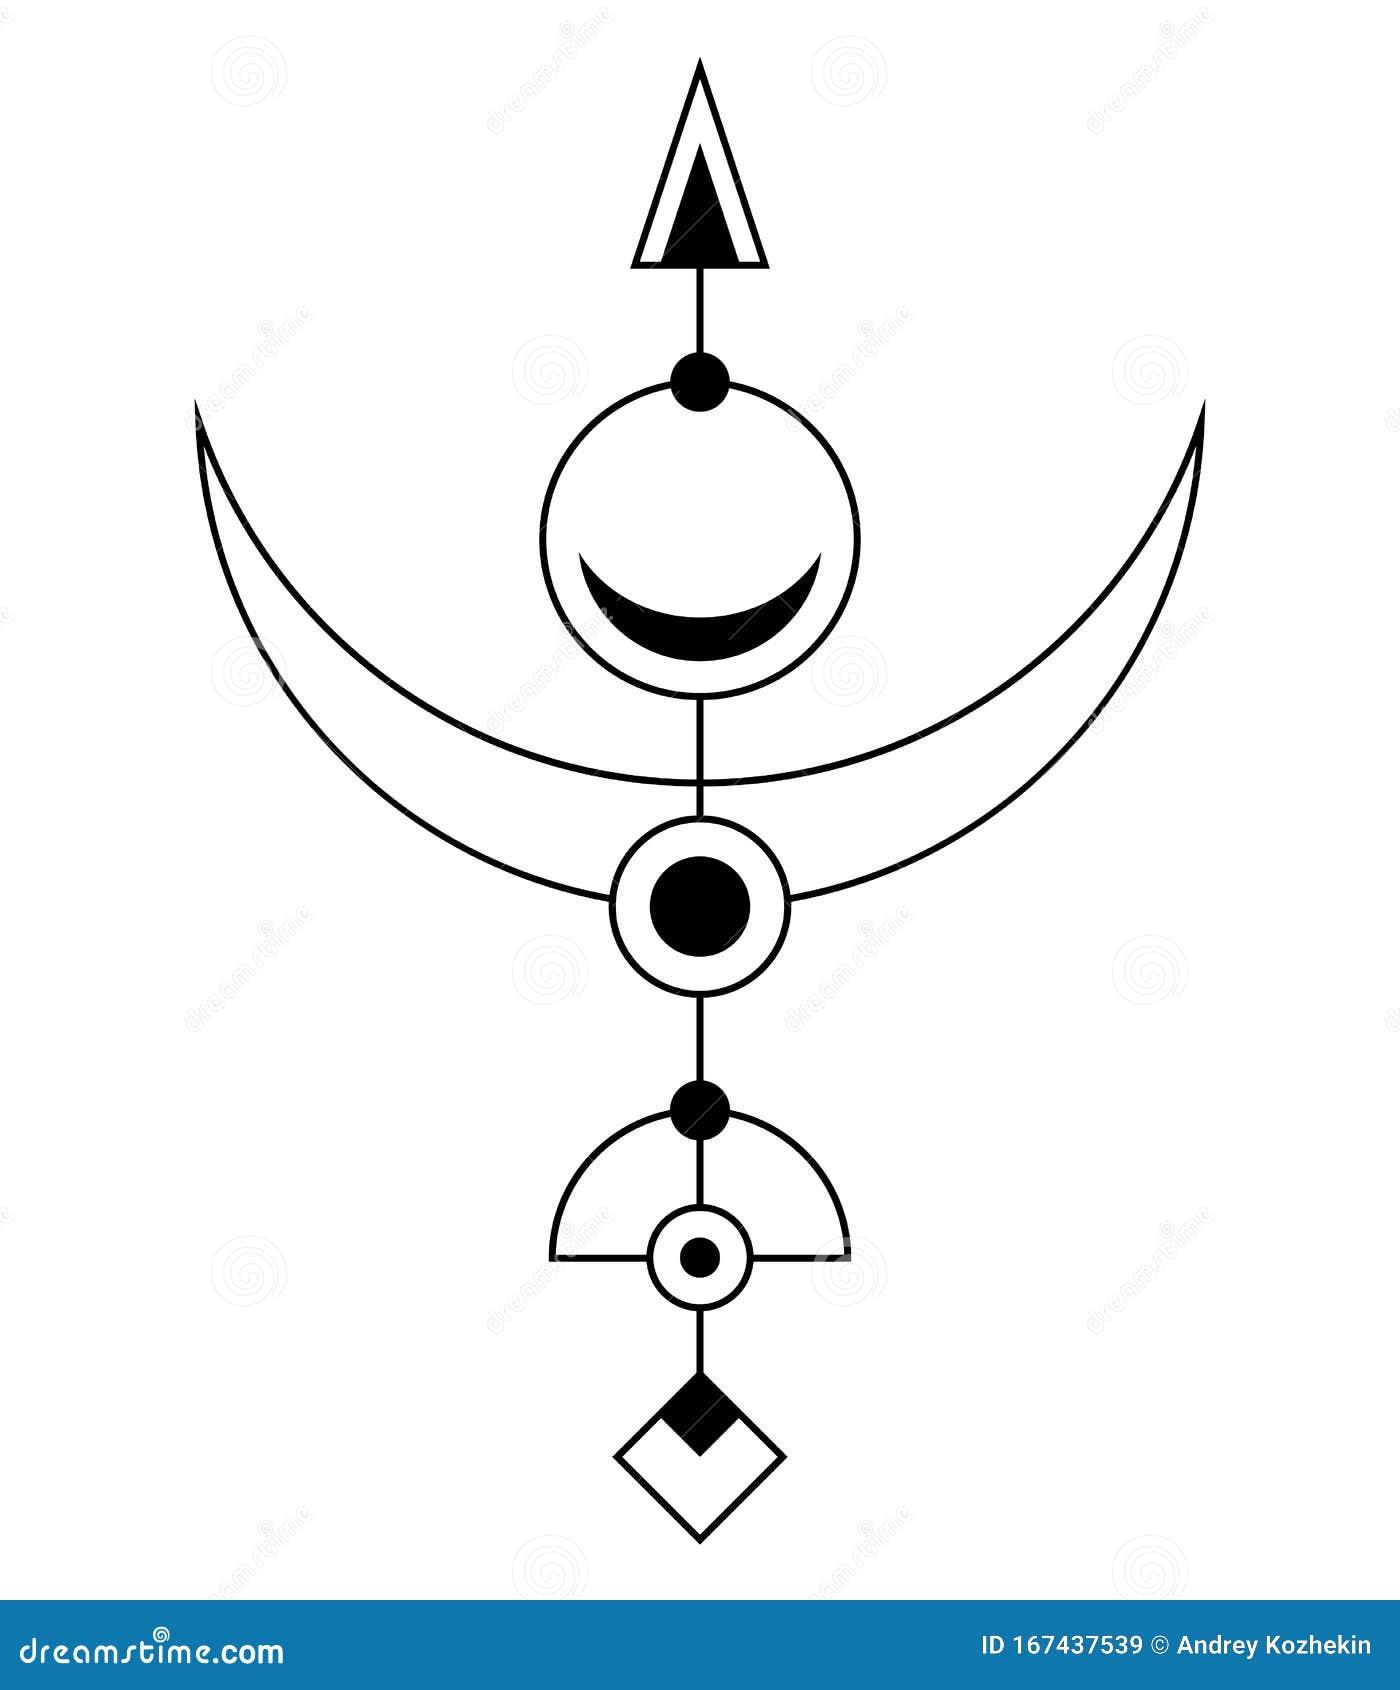 Abstract Geometric Symbol Sacred Geometry Sign Stock Vector Illustration Of Print Symbol 167437539,Website Design Boca Raton